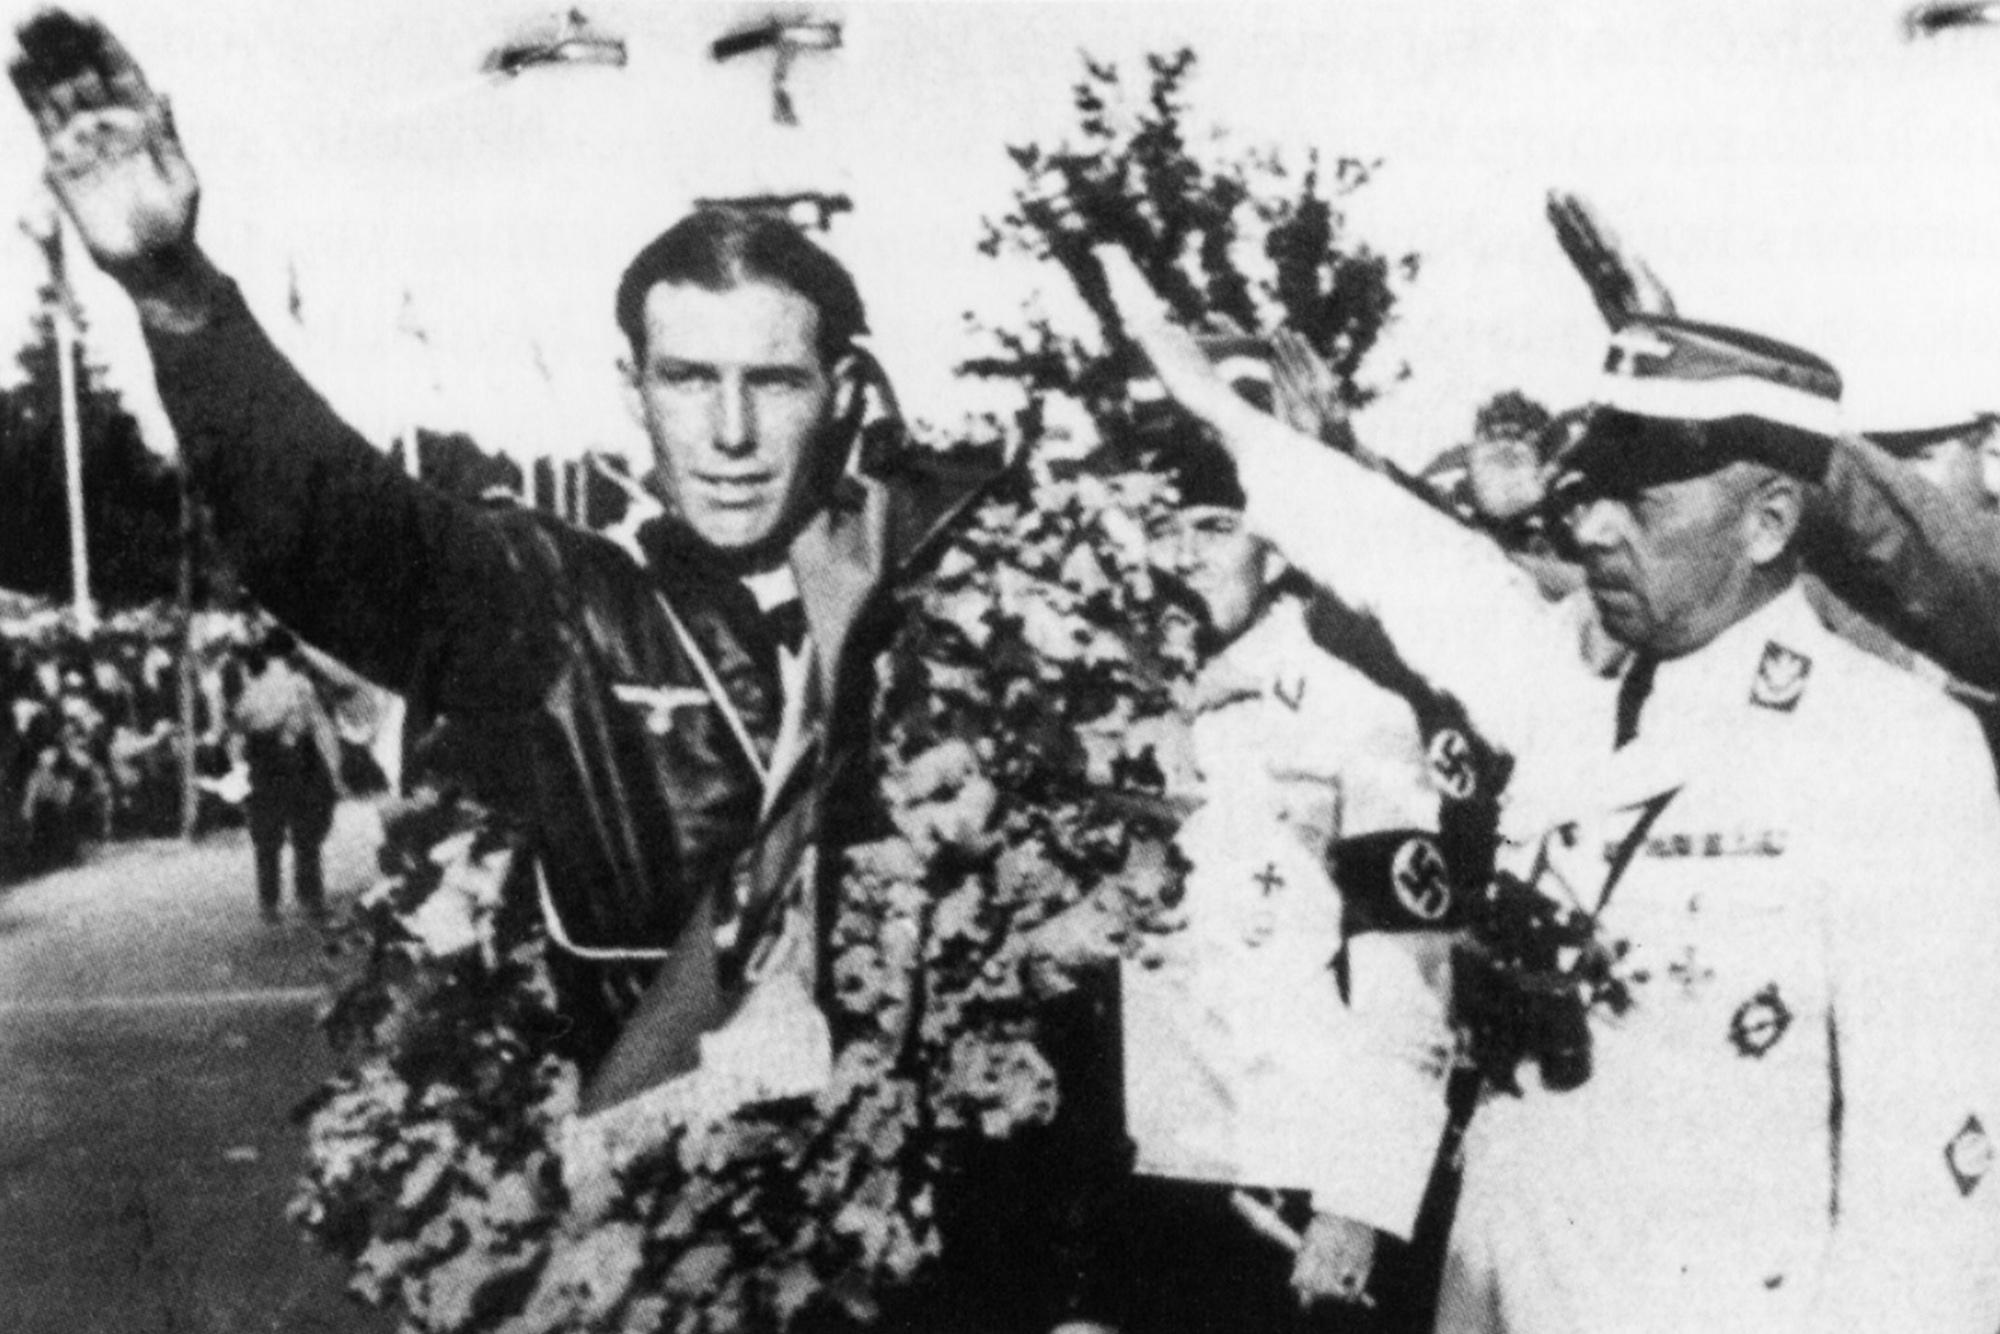 Georg Meier salutes alongside Adolf Huhnlein